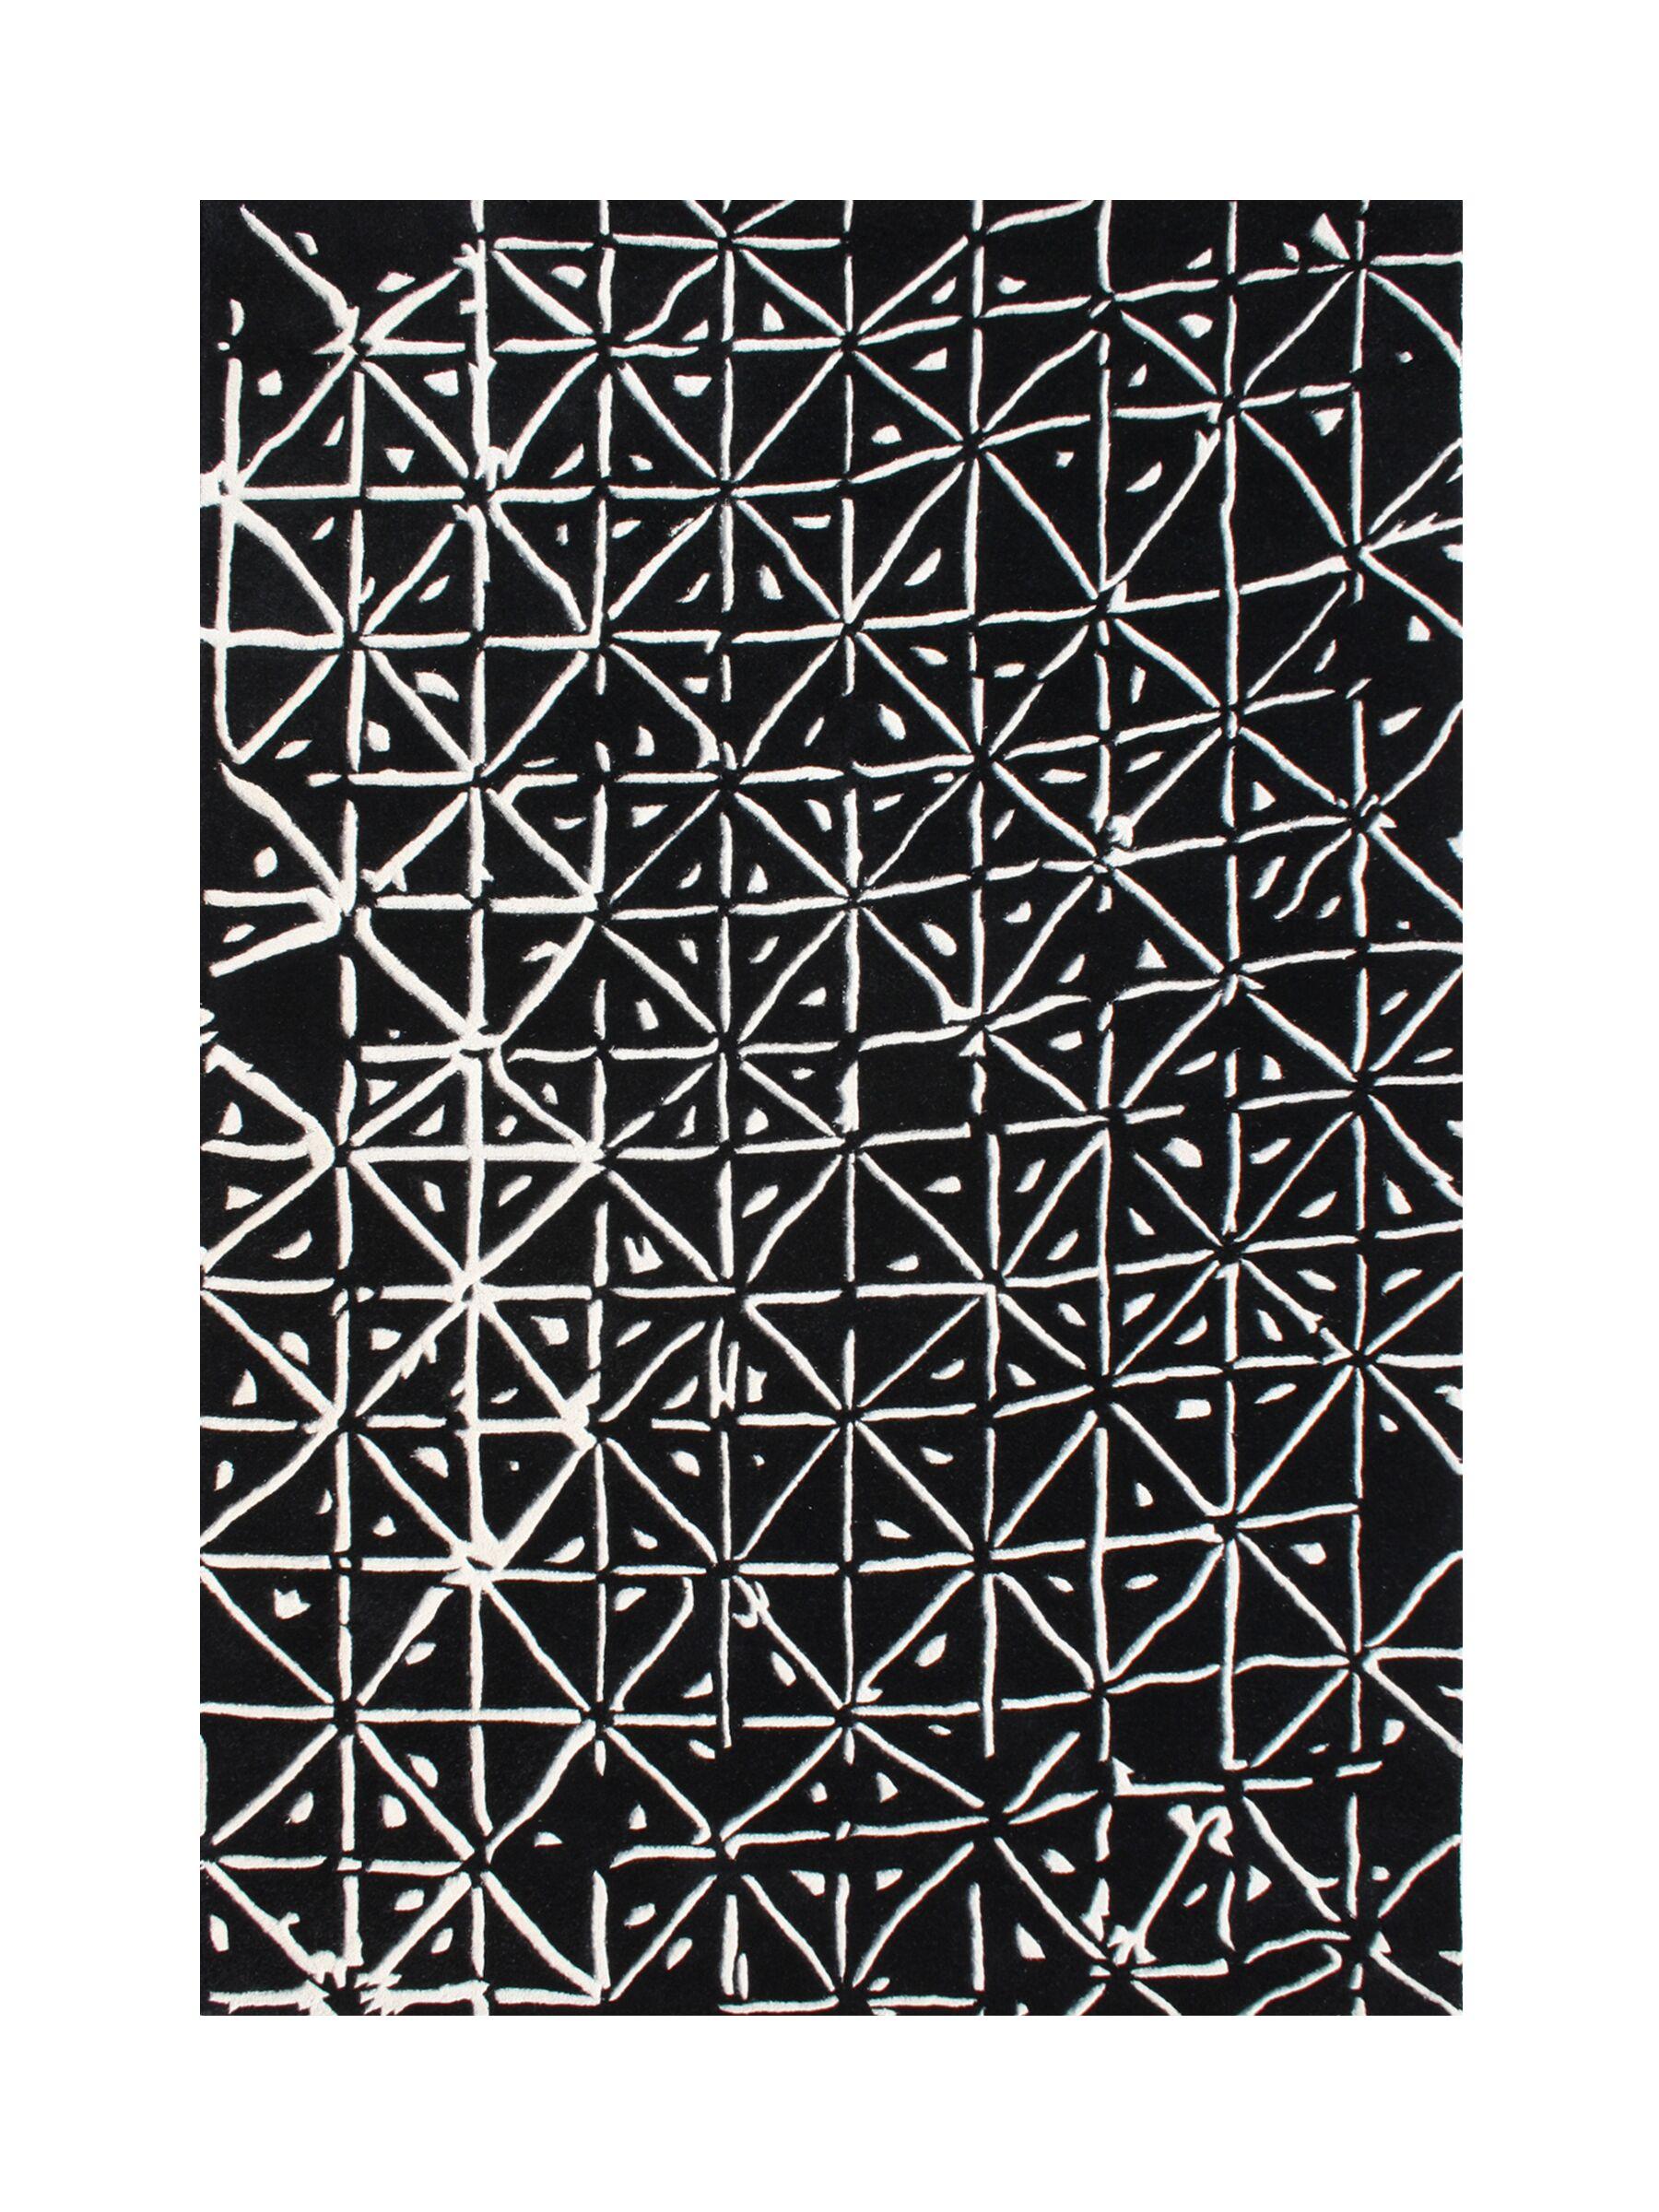 Wamic Hand-Tufted Black/White Area Rug Rug Size: Rectangle 9' x 12'